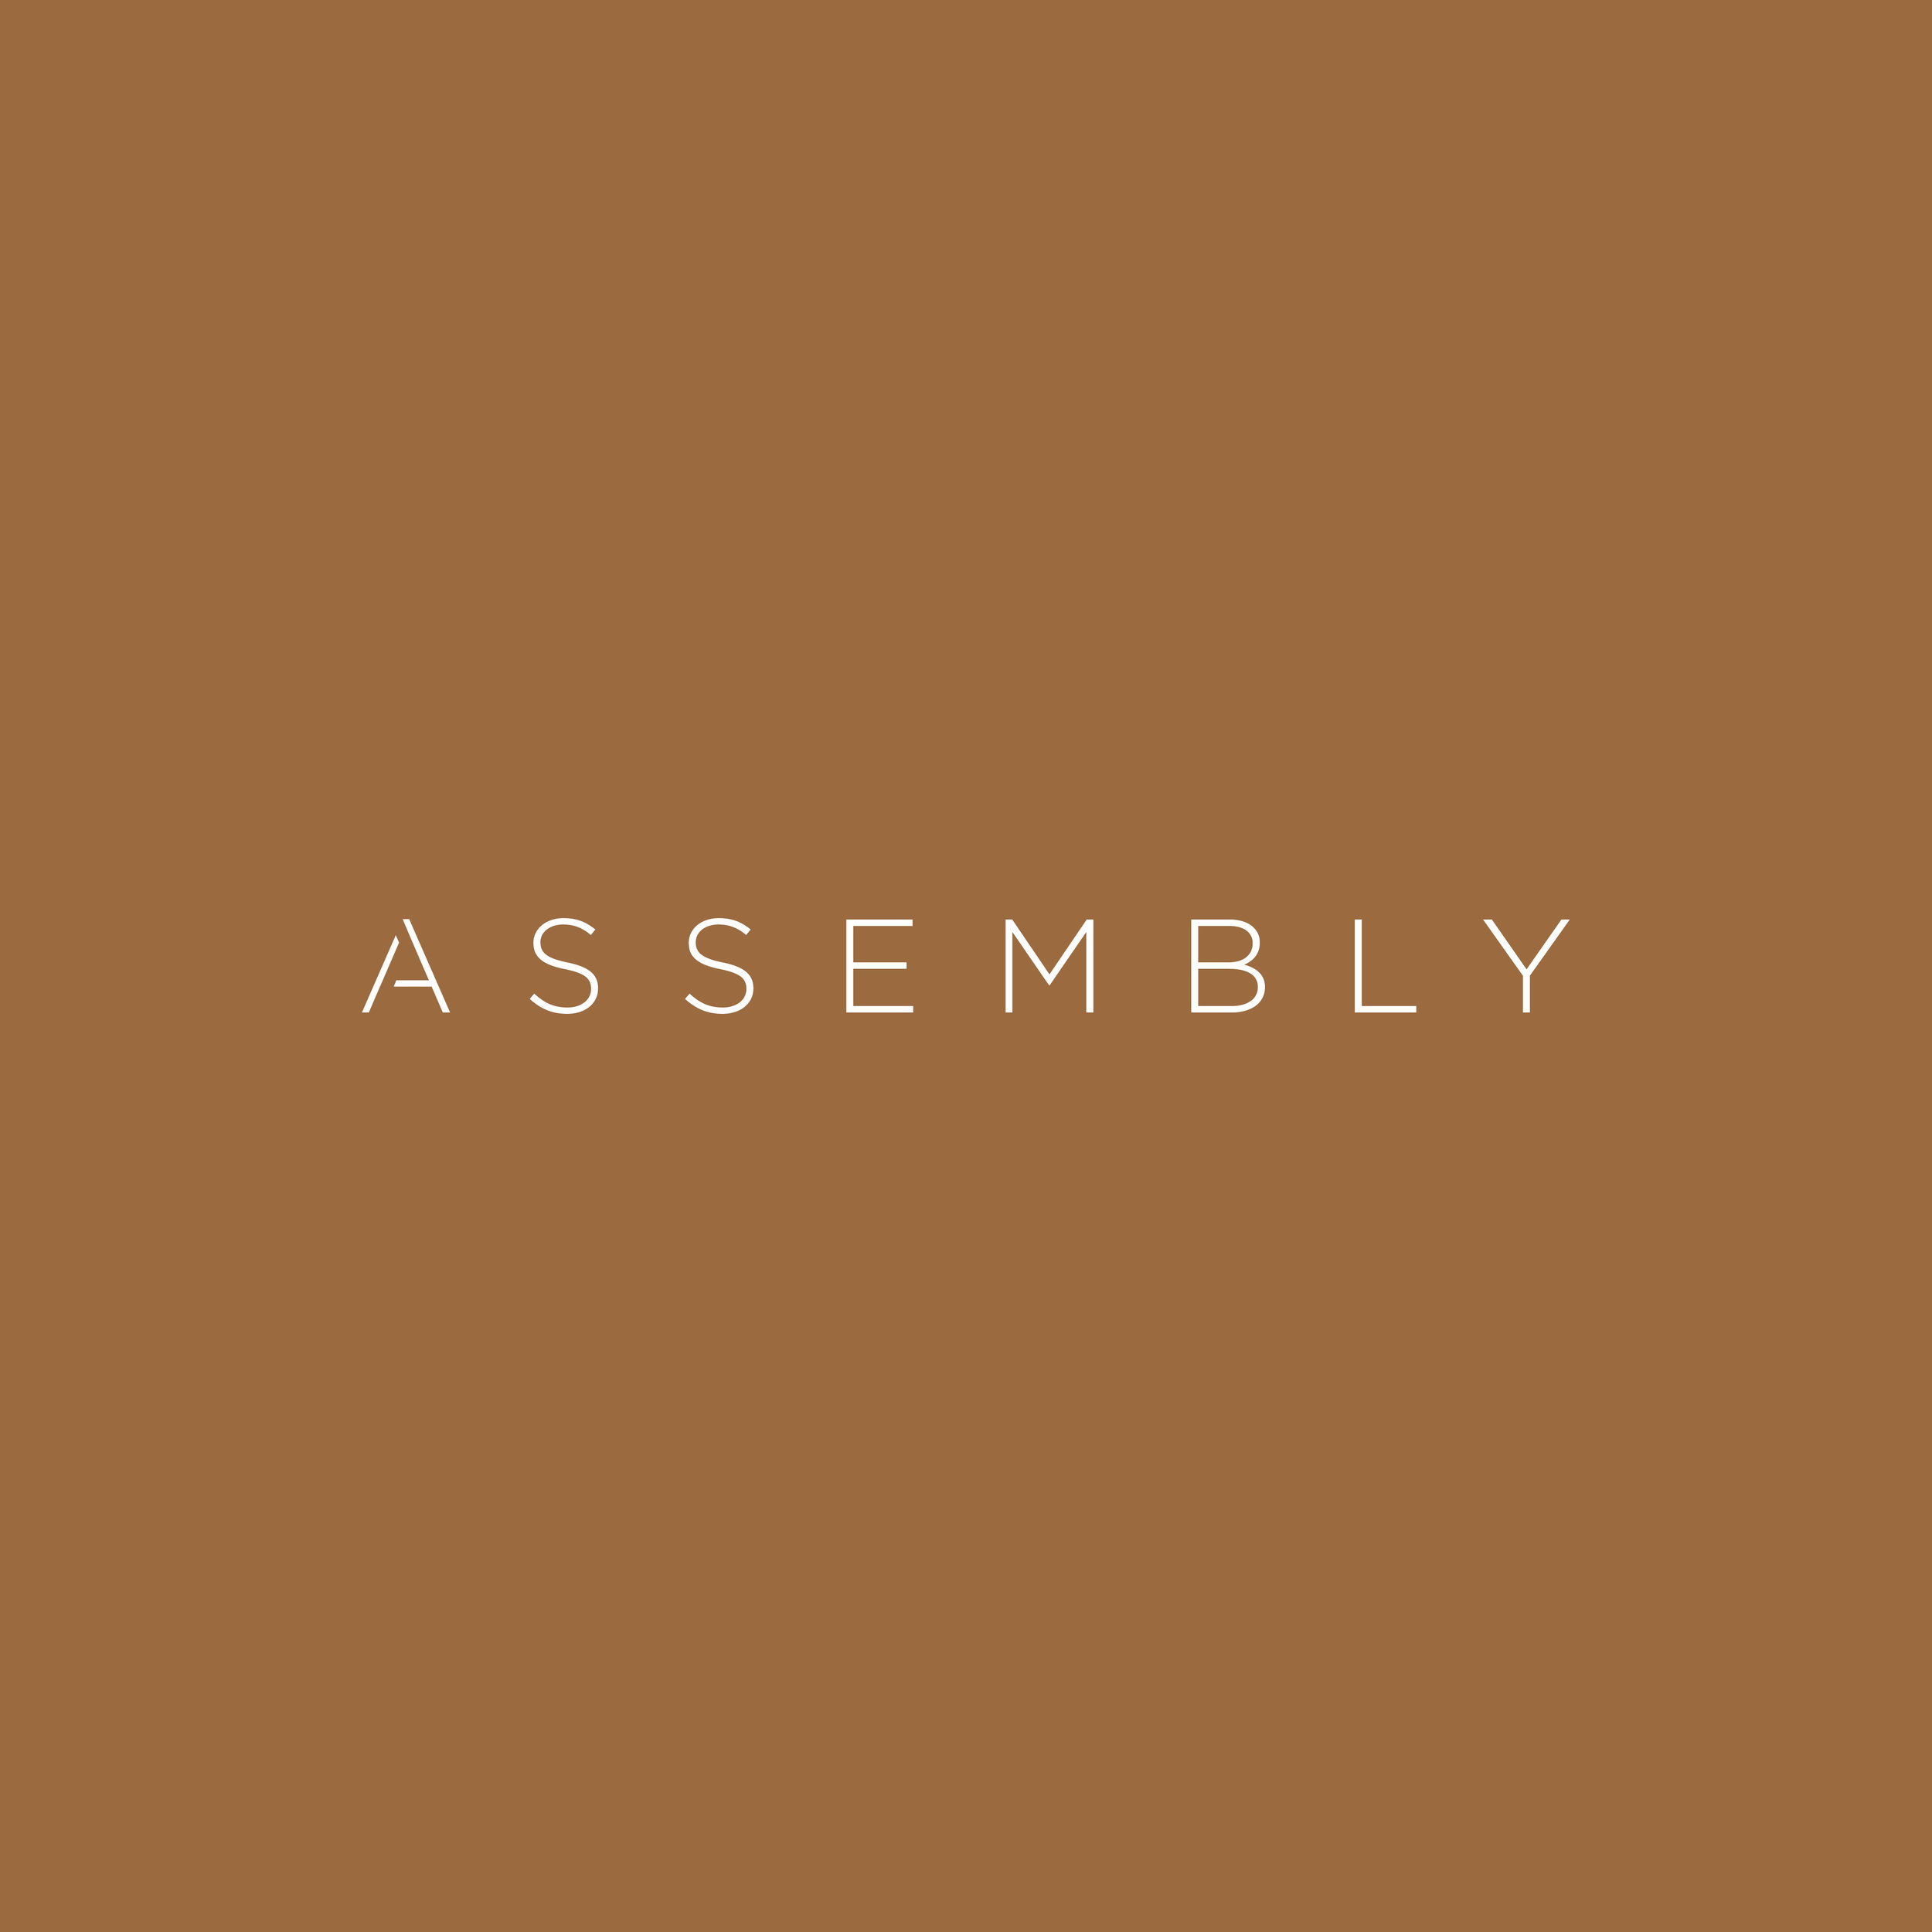 Assembly_main-05.jpg